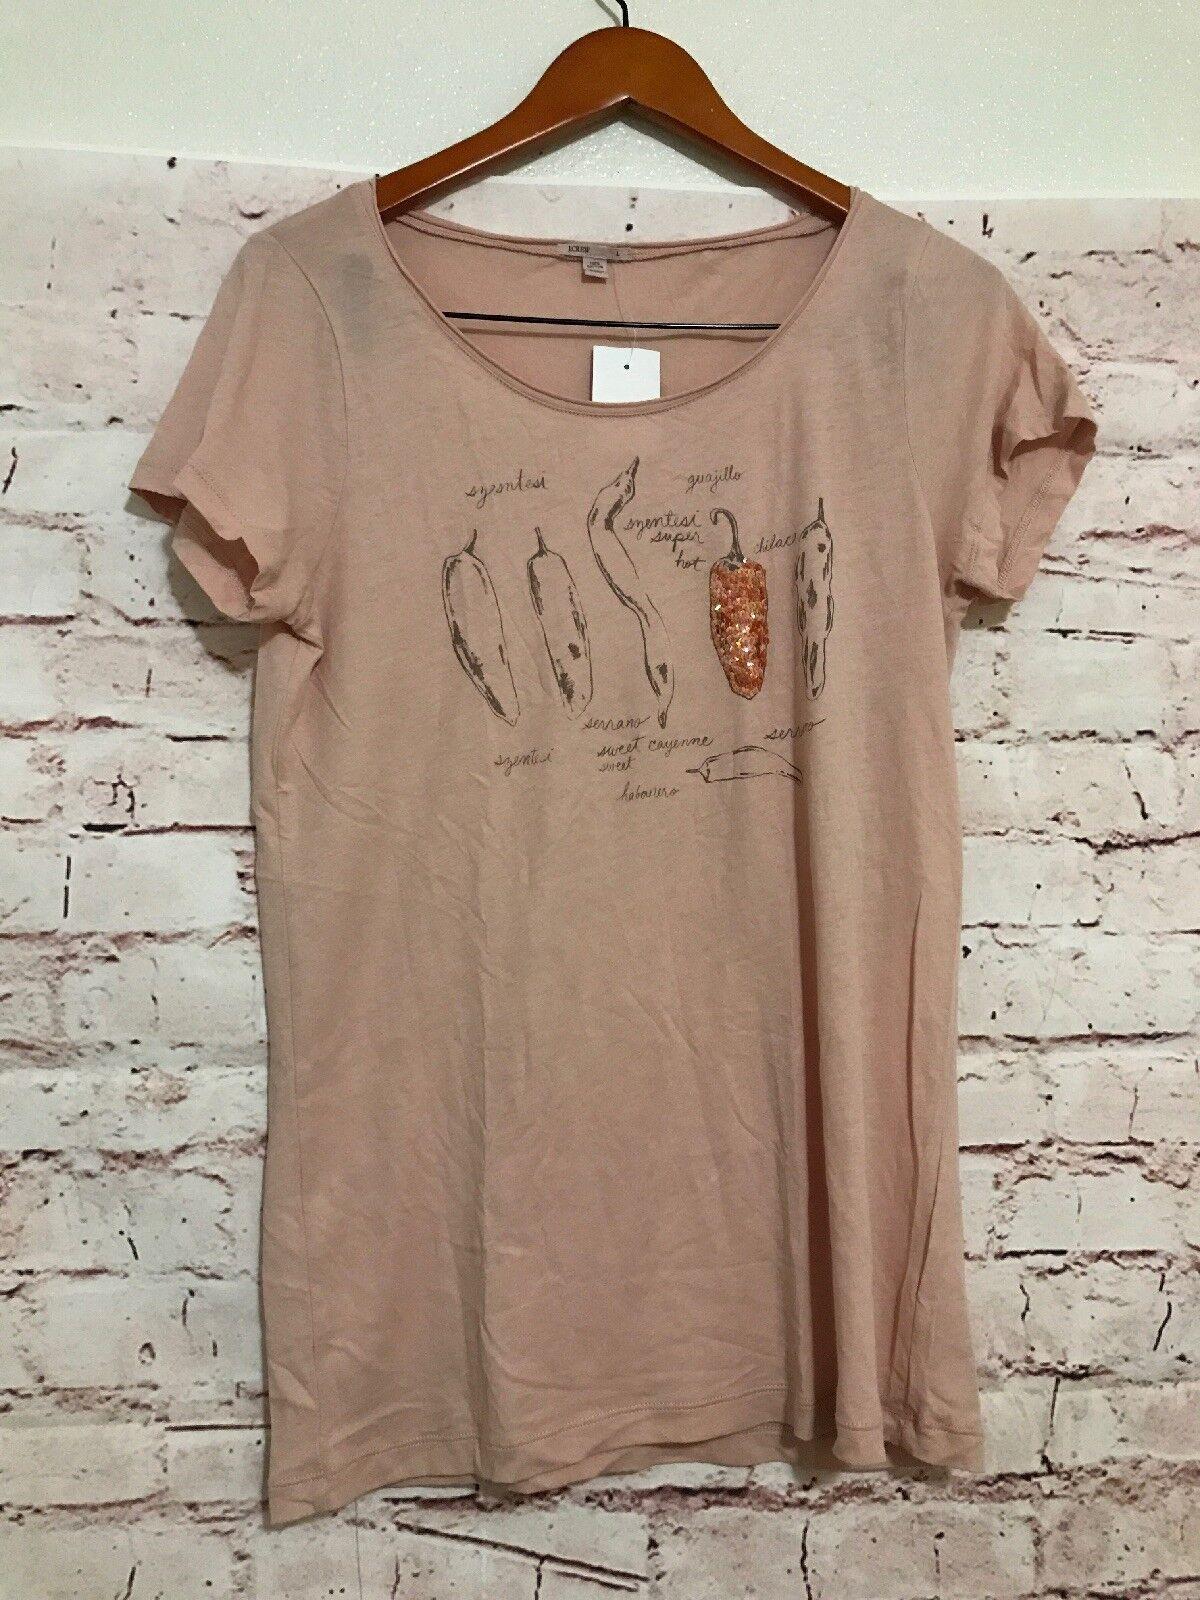 J Crew Womens Short Sleeve Pepper Shirt Embellished Pink Size Large Nwt C54